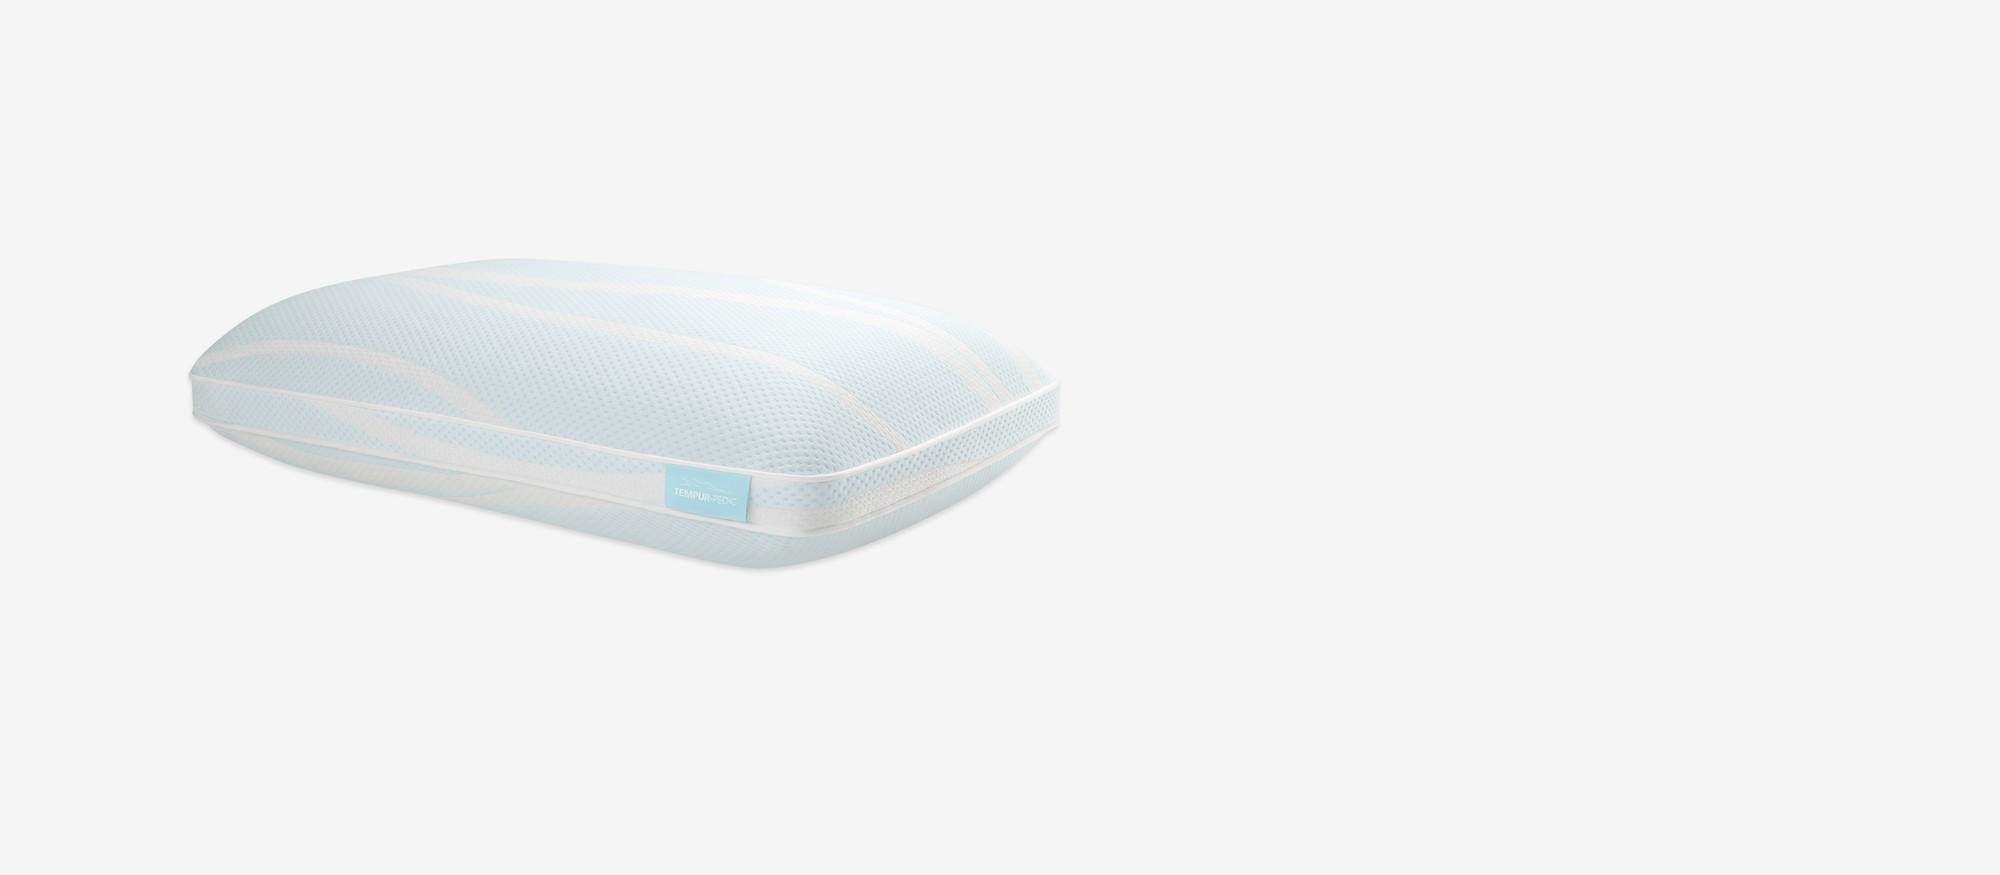 Breeze 176 Pro Advanced Cooling Pillow Tempur Pedic